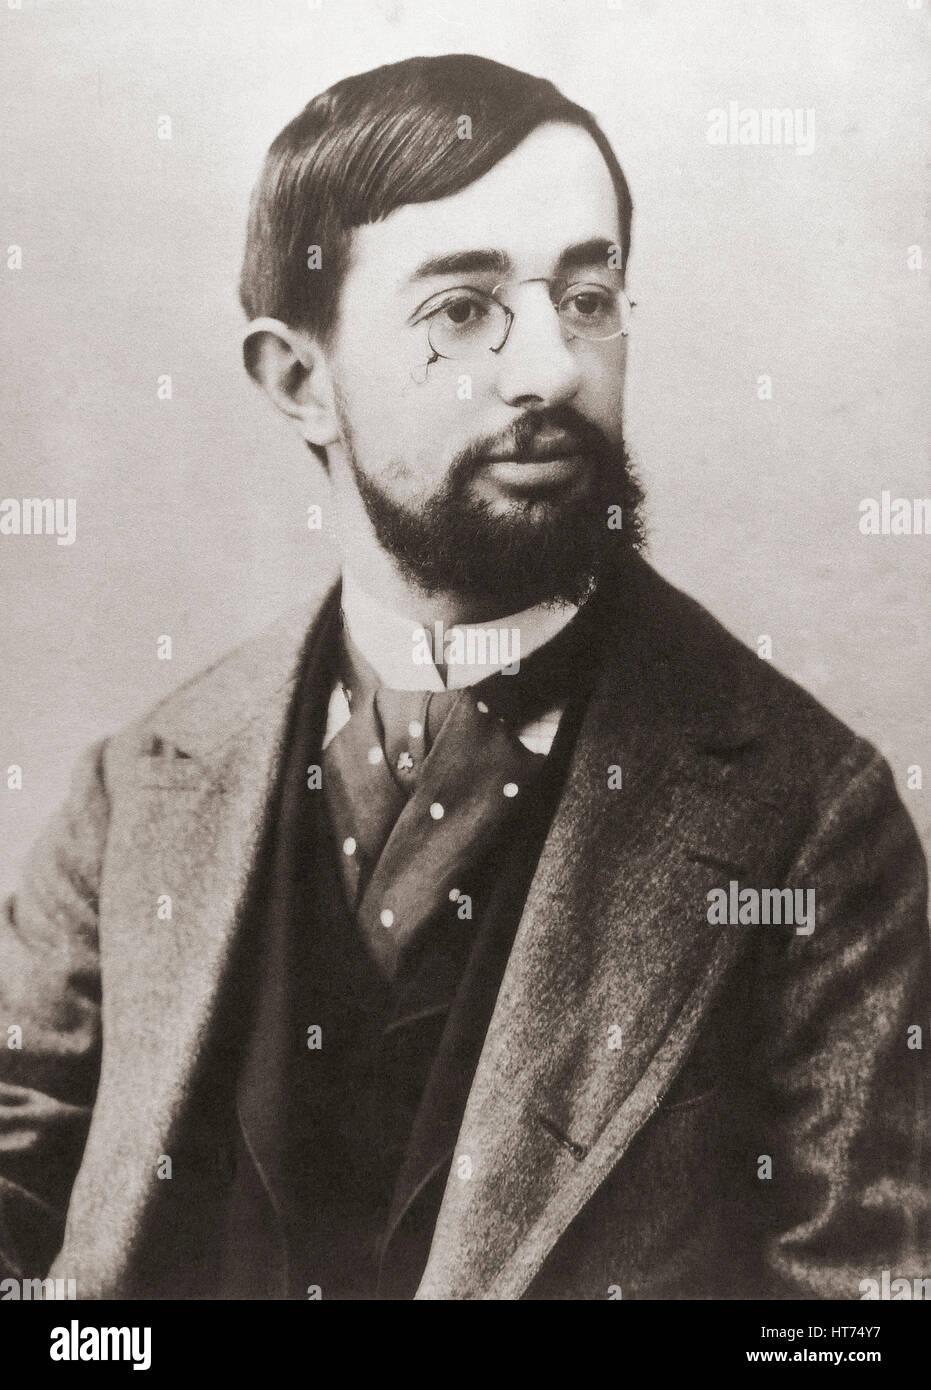 Henri Marie Raymond de Toulouse-Lautrec-Monfa, 1864-1901.  Französischer Künstler, Grafiker, Zeichner Stockbild